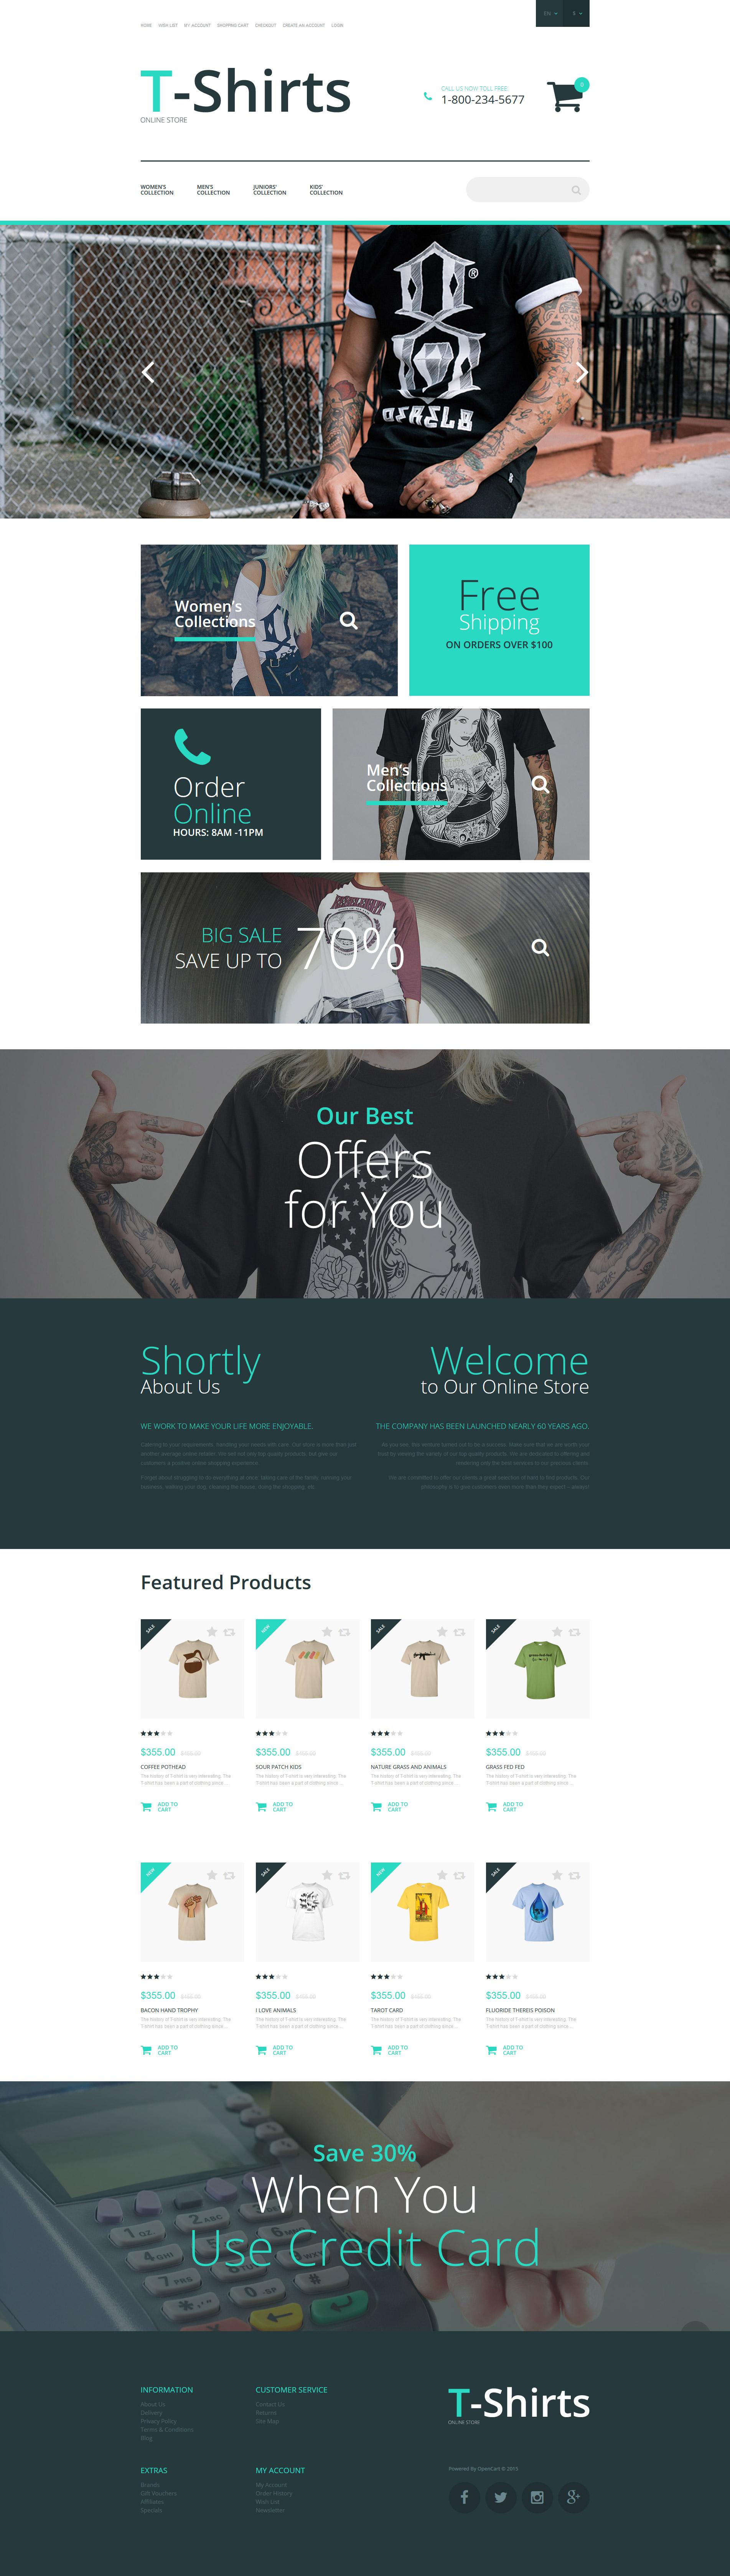 Free T Shirt Design Website Templates Joe Maloy